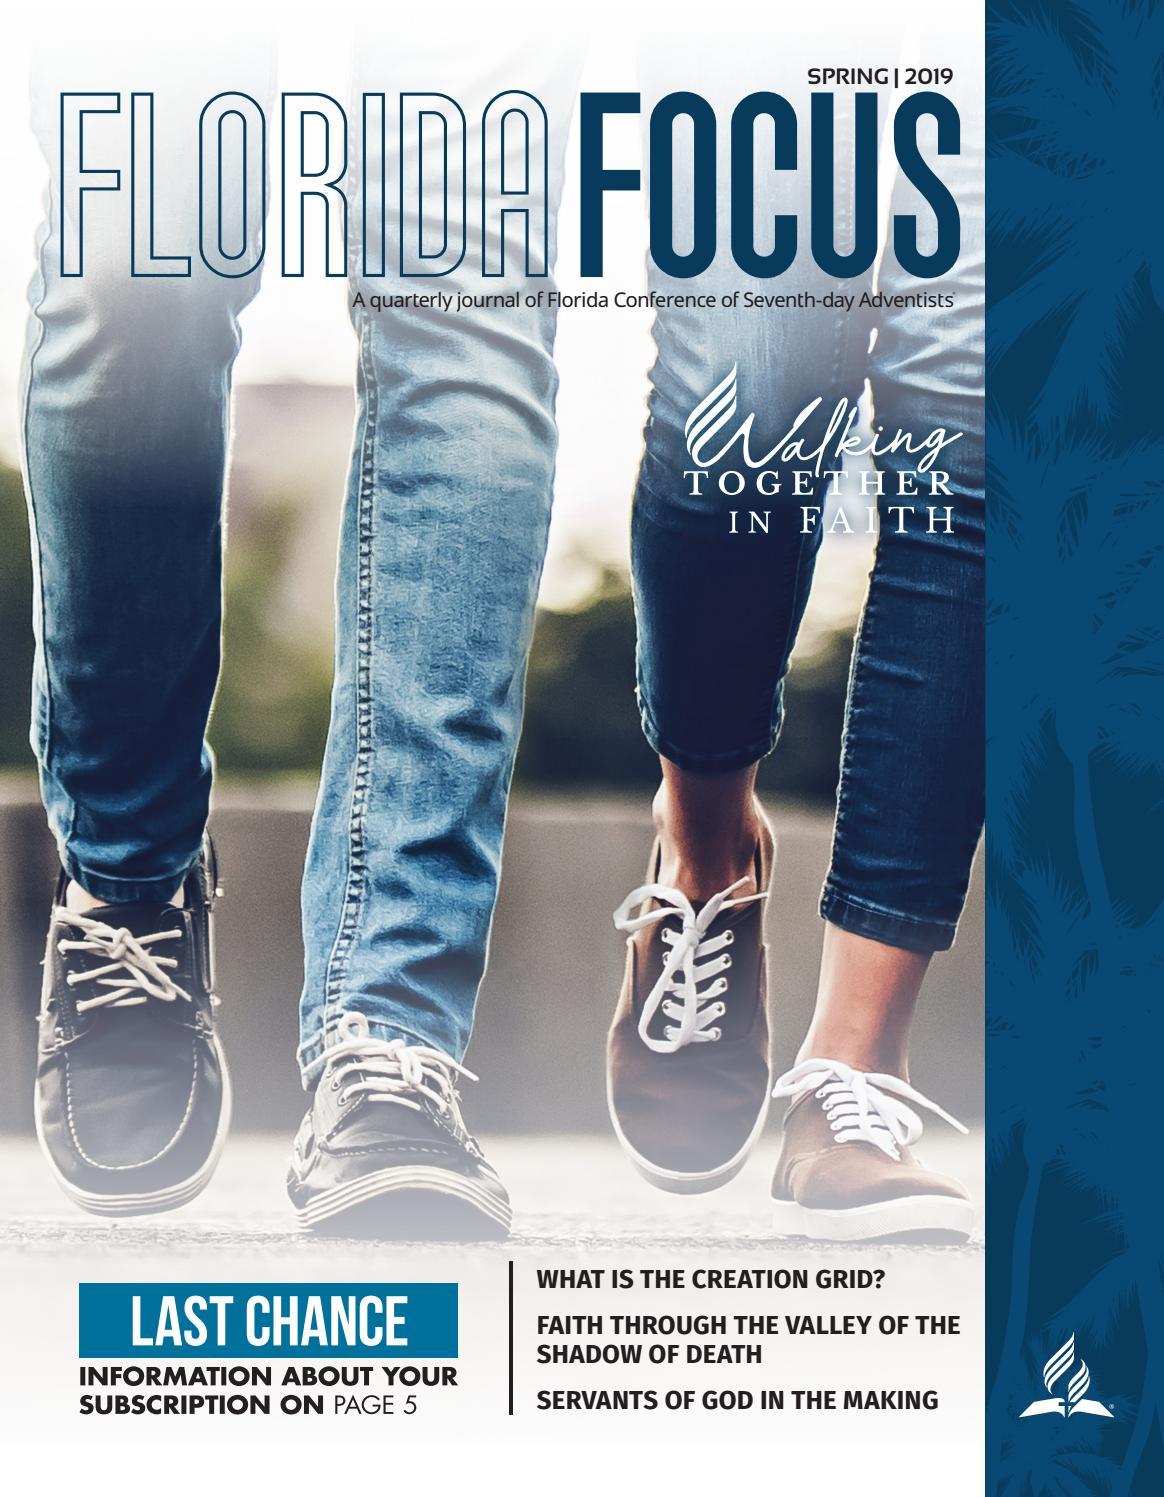 Florida Focus Spring 2019 by floridafocus - issuu